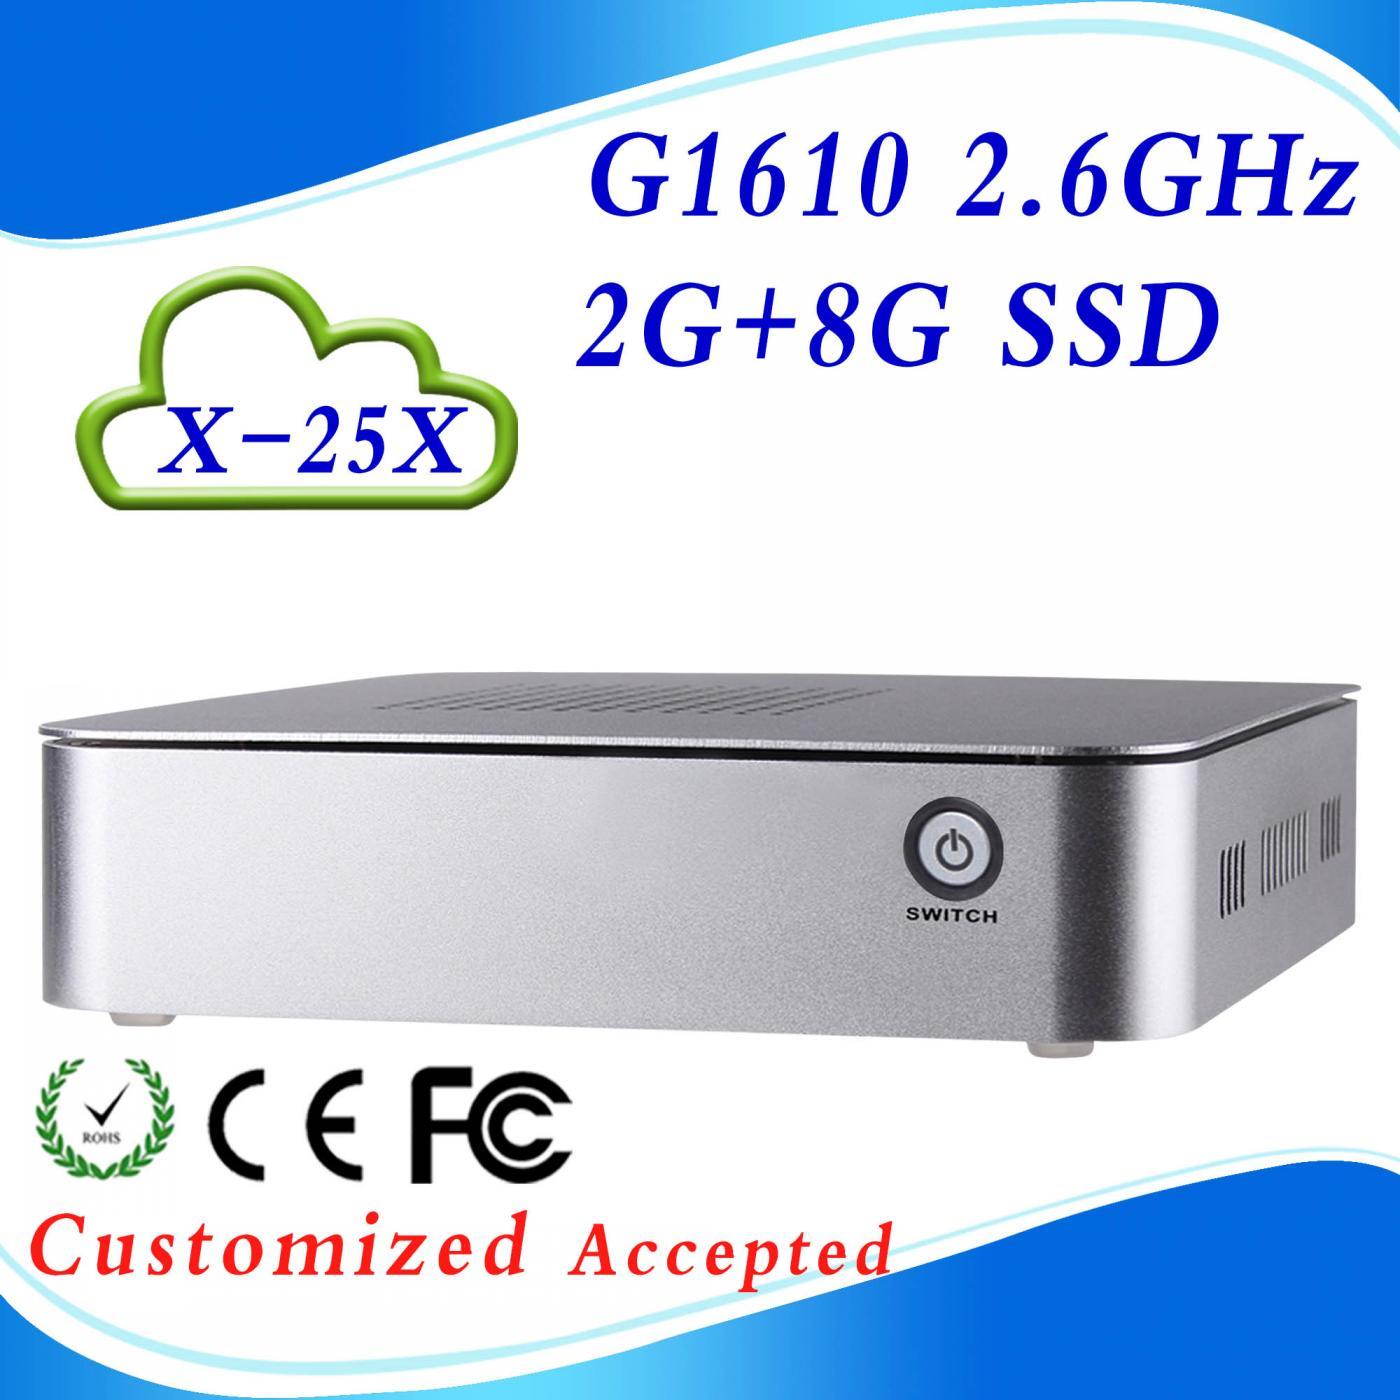 Hot sale INTE G1610 X-25X 2G RAM 8G SSD Virtual desktop computer Mini Virtual computer network ncomputing support movies(China (Mainland))